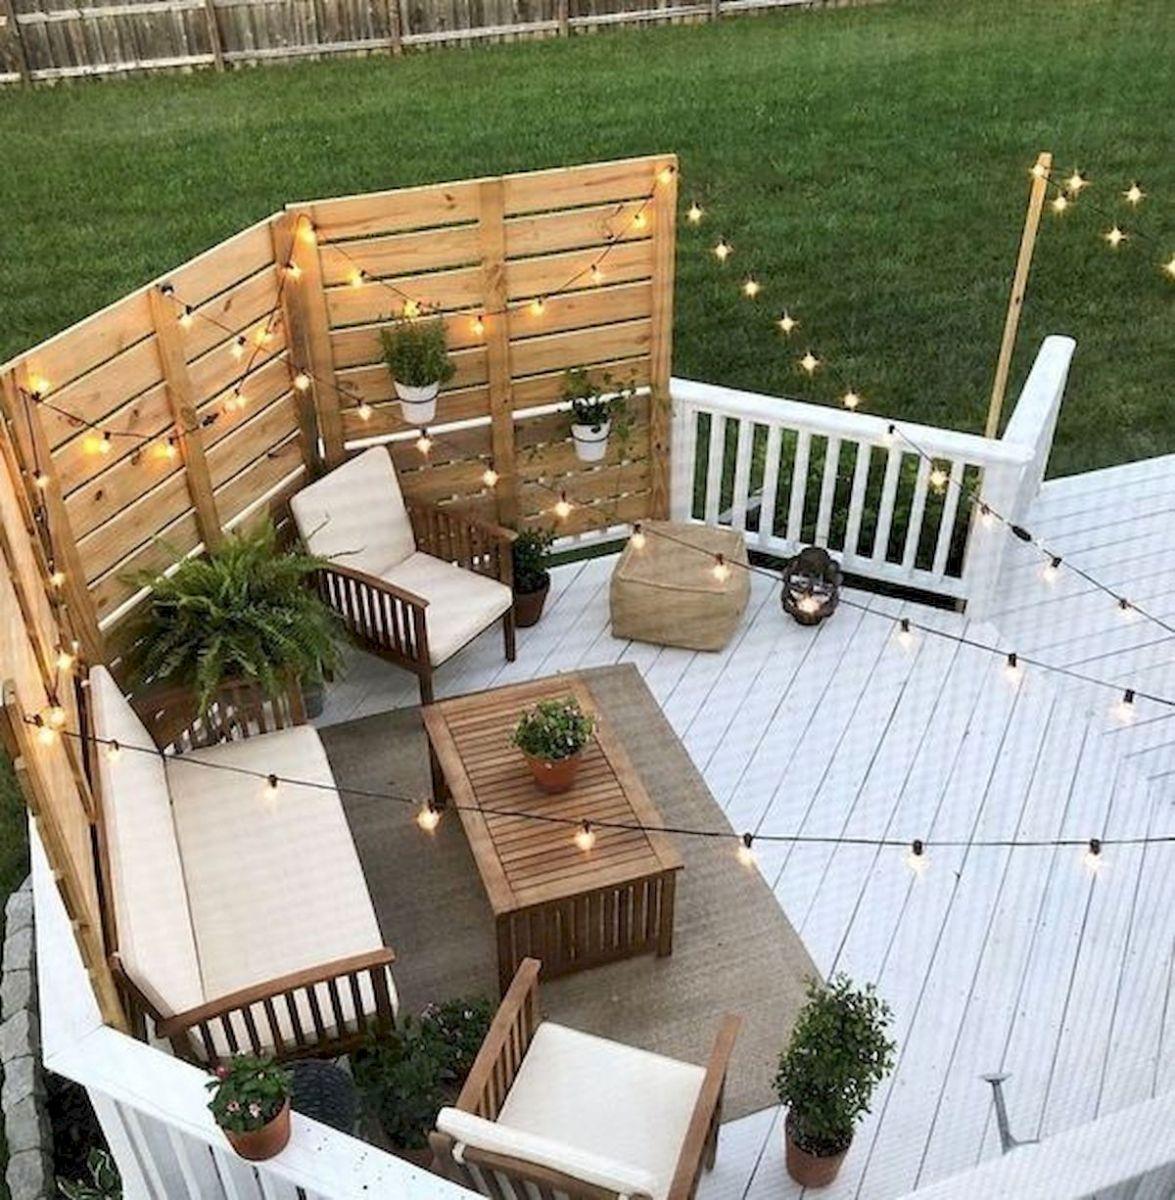 50 Best DIY Backyard Patio and Decking Design Ideas (15)